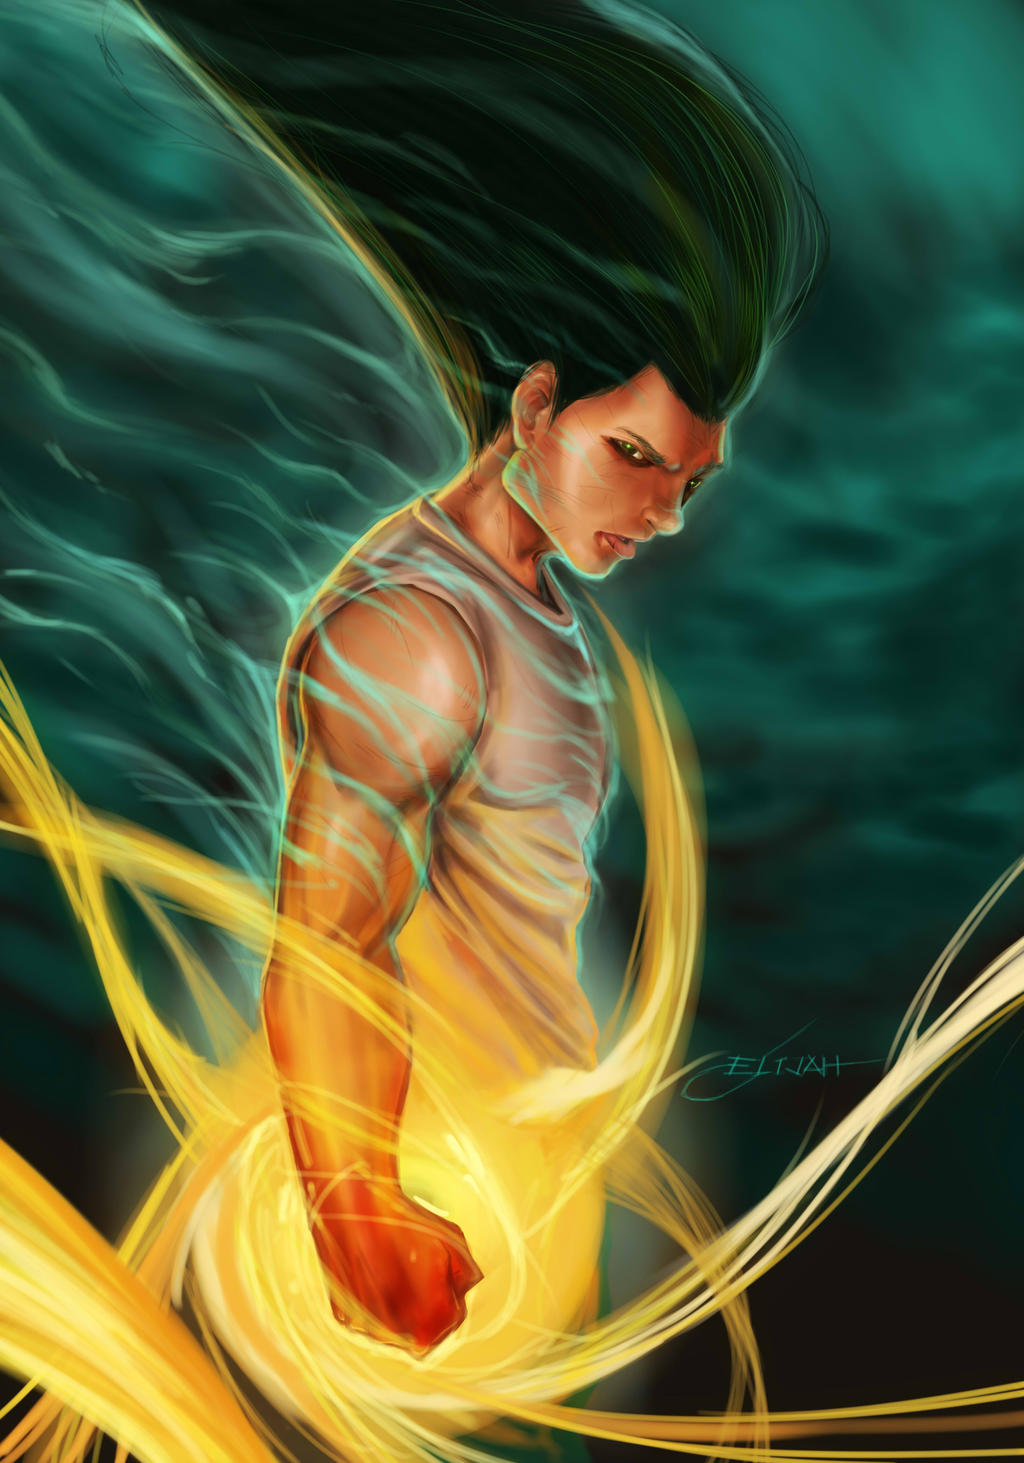 Top personagens mais fortes de Hunter X Hunter Gon_freecs__hunter_x_hunter_fan_art__by_elijahtan-d7eelwg